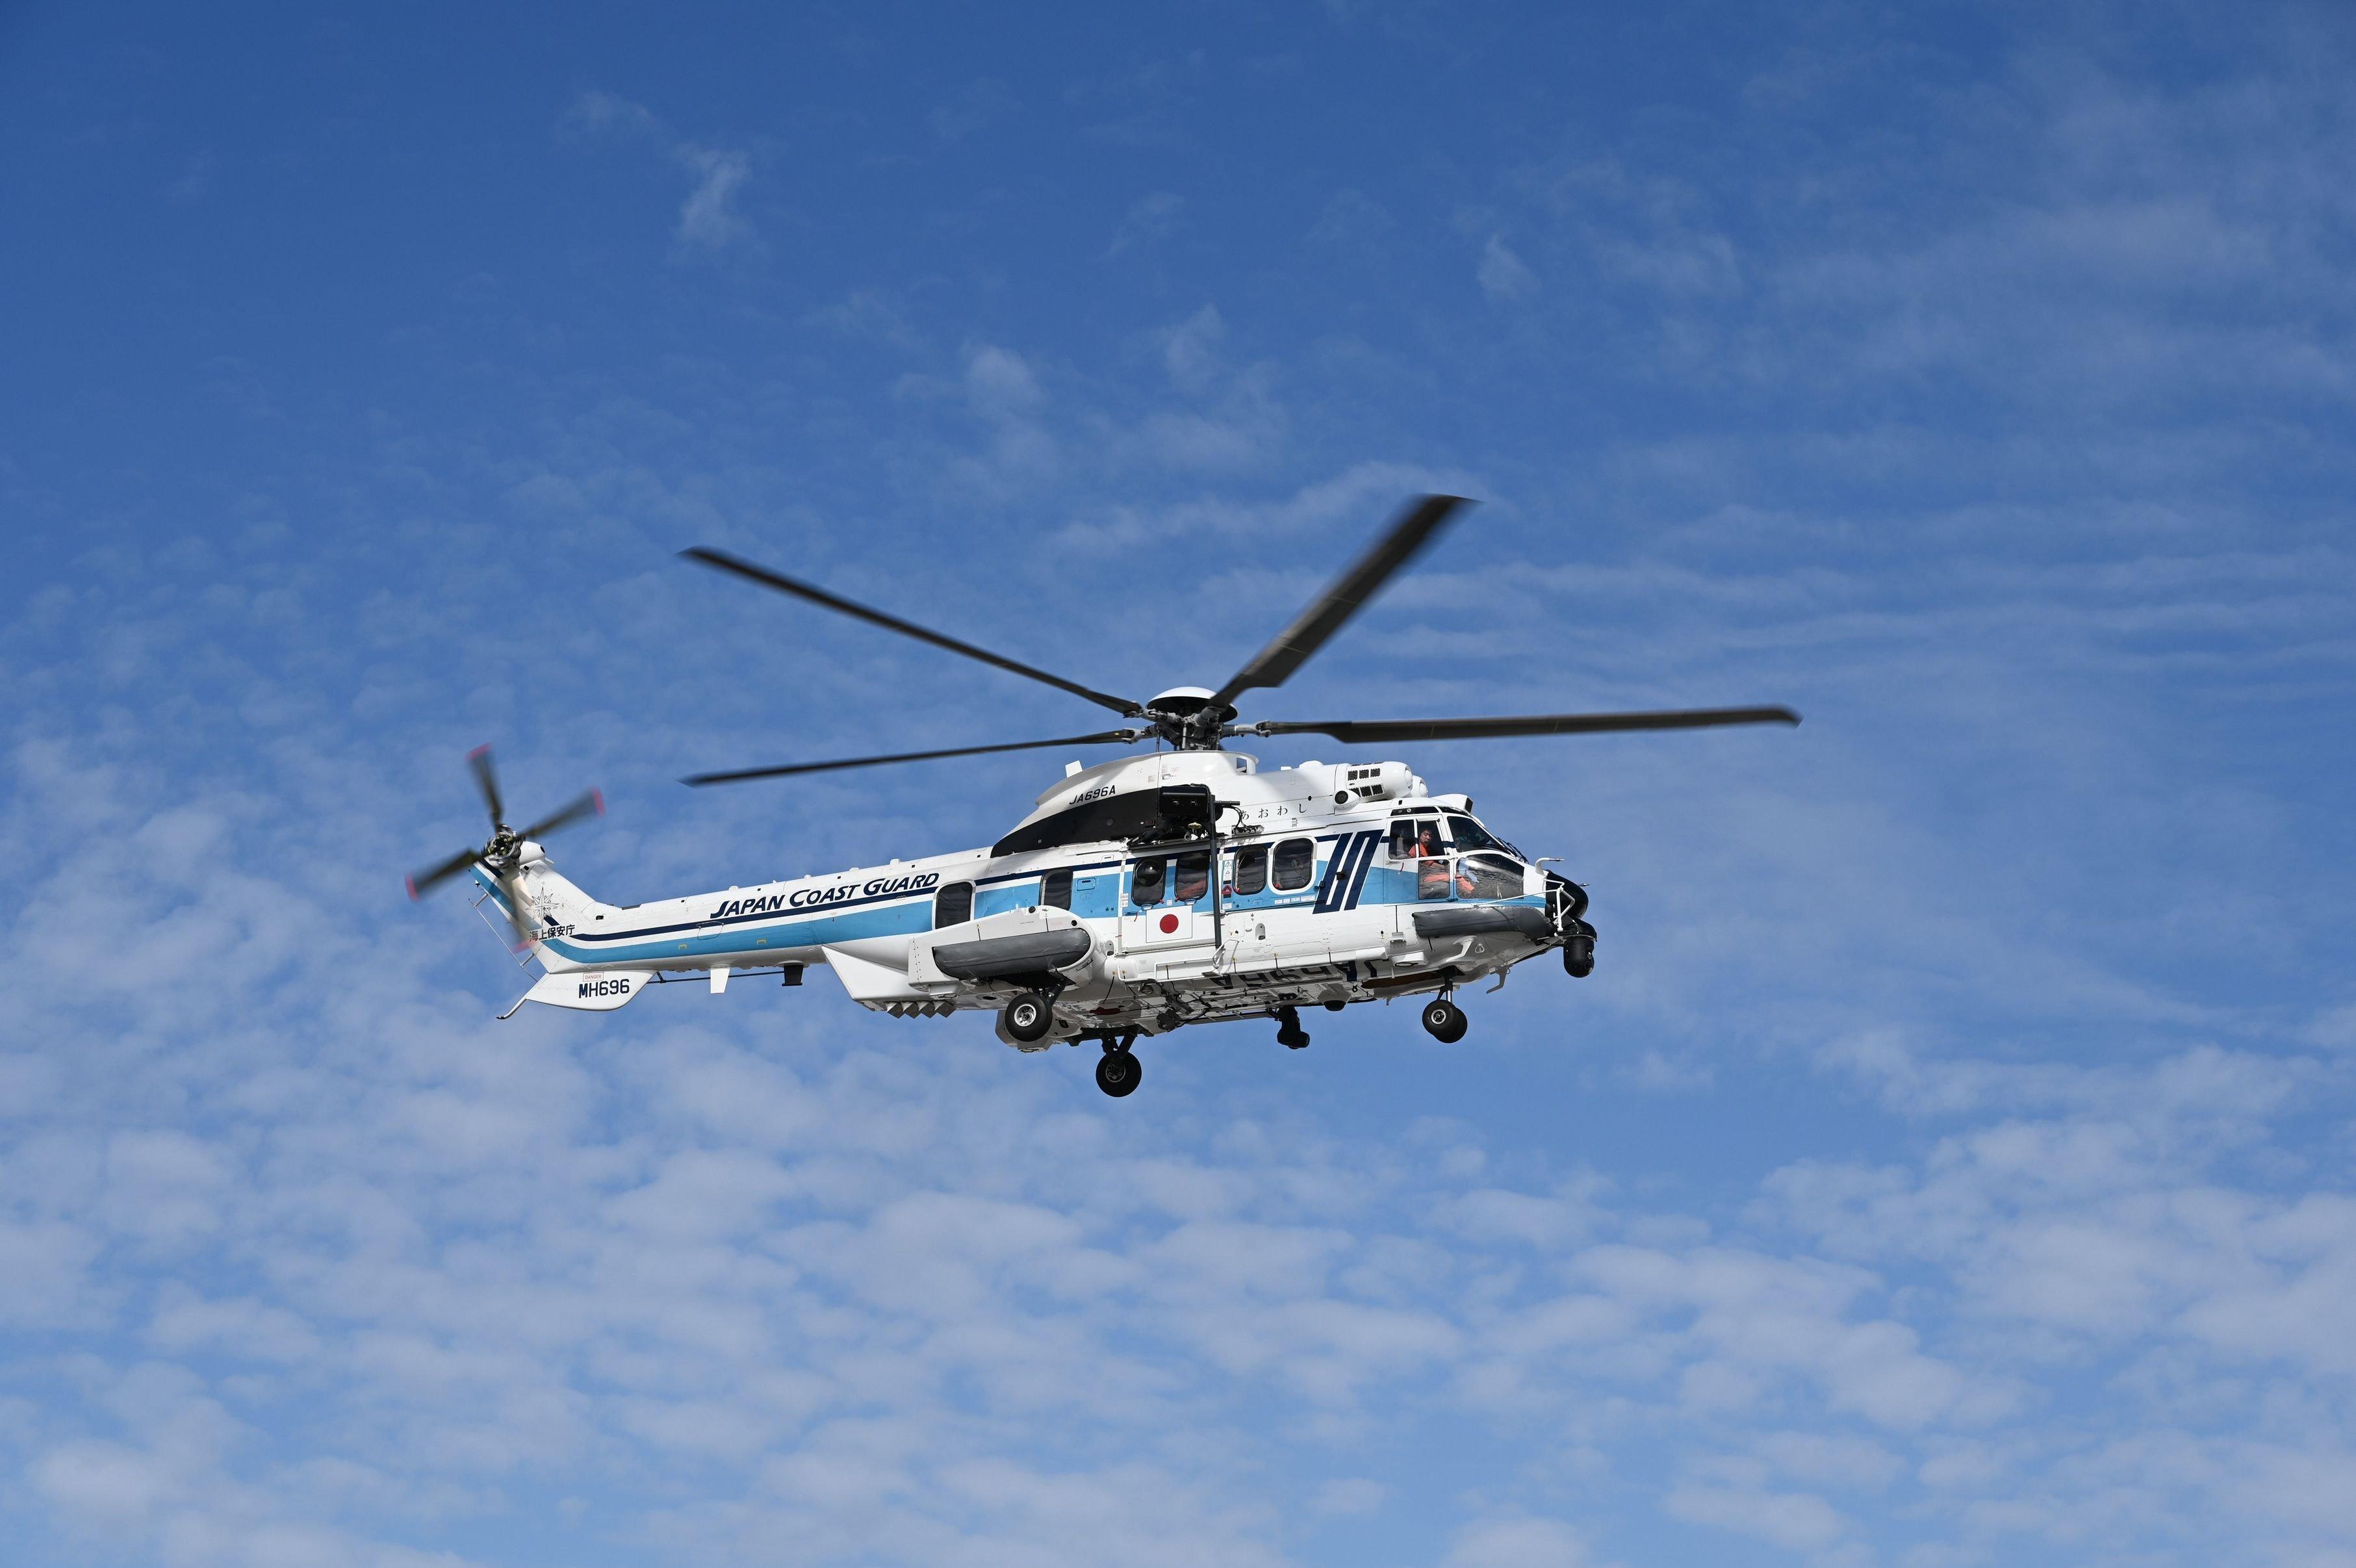 Japan Coast Guard Super Puma [Airbus]